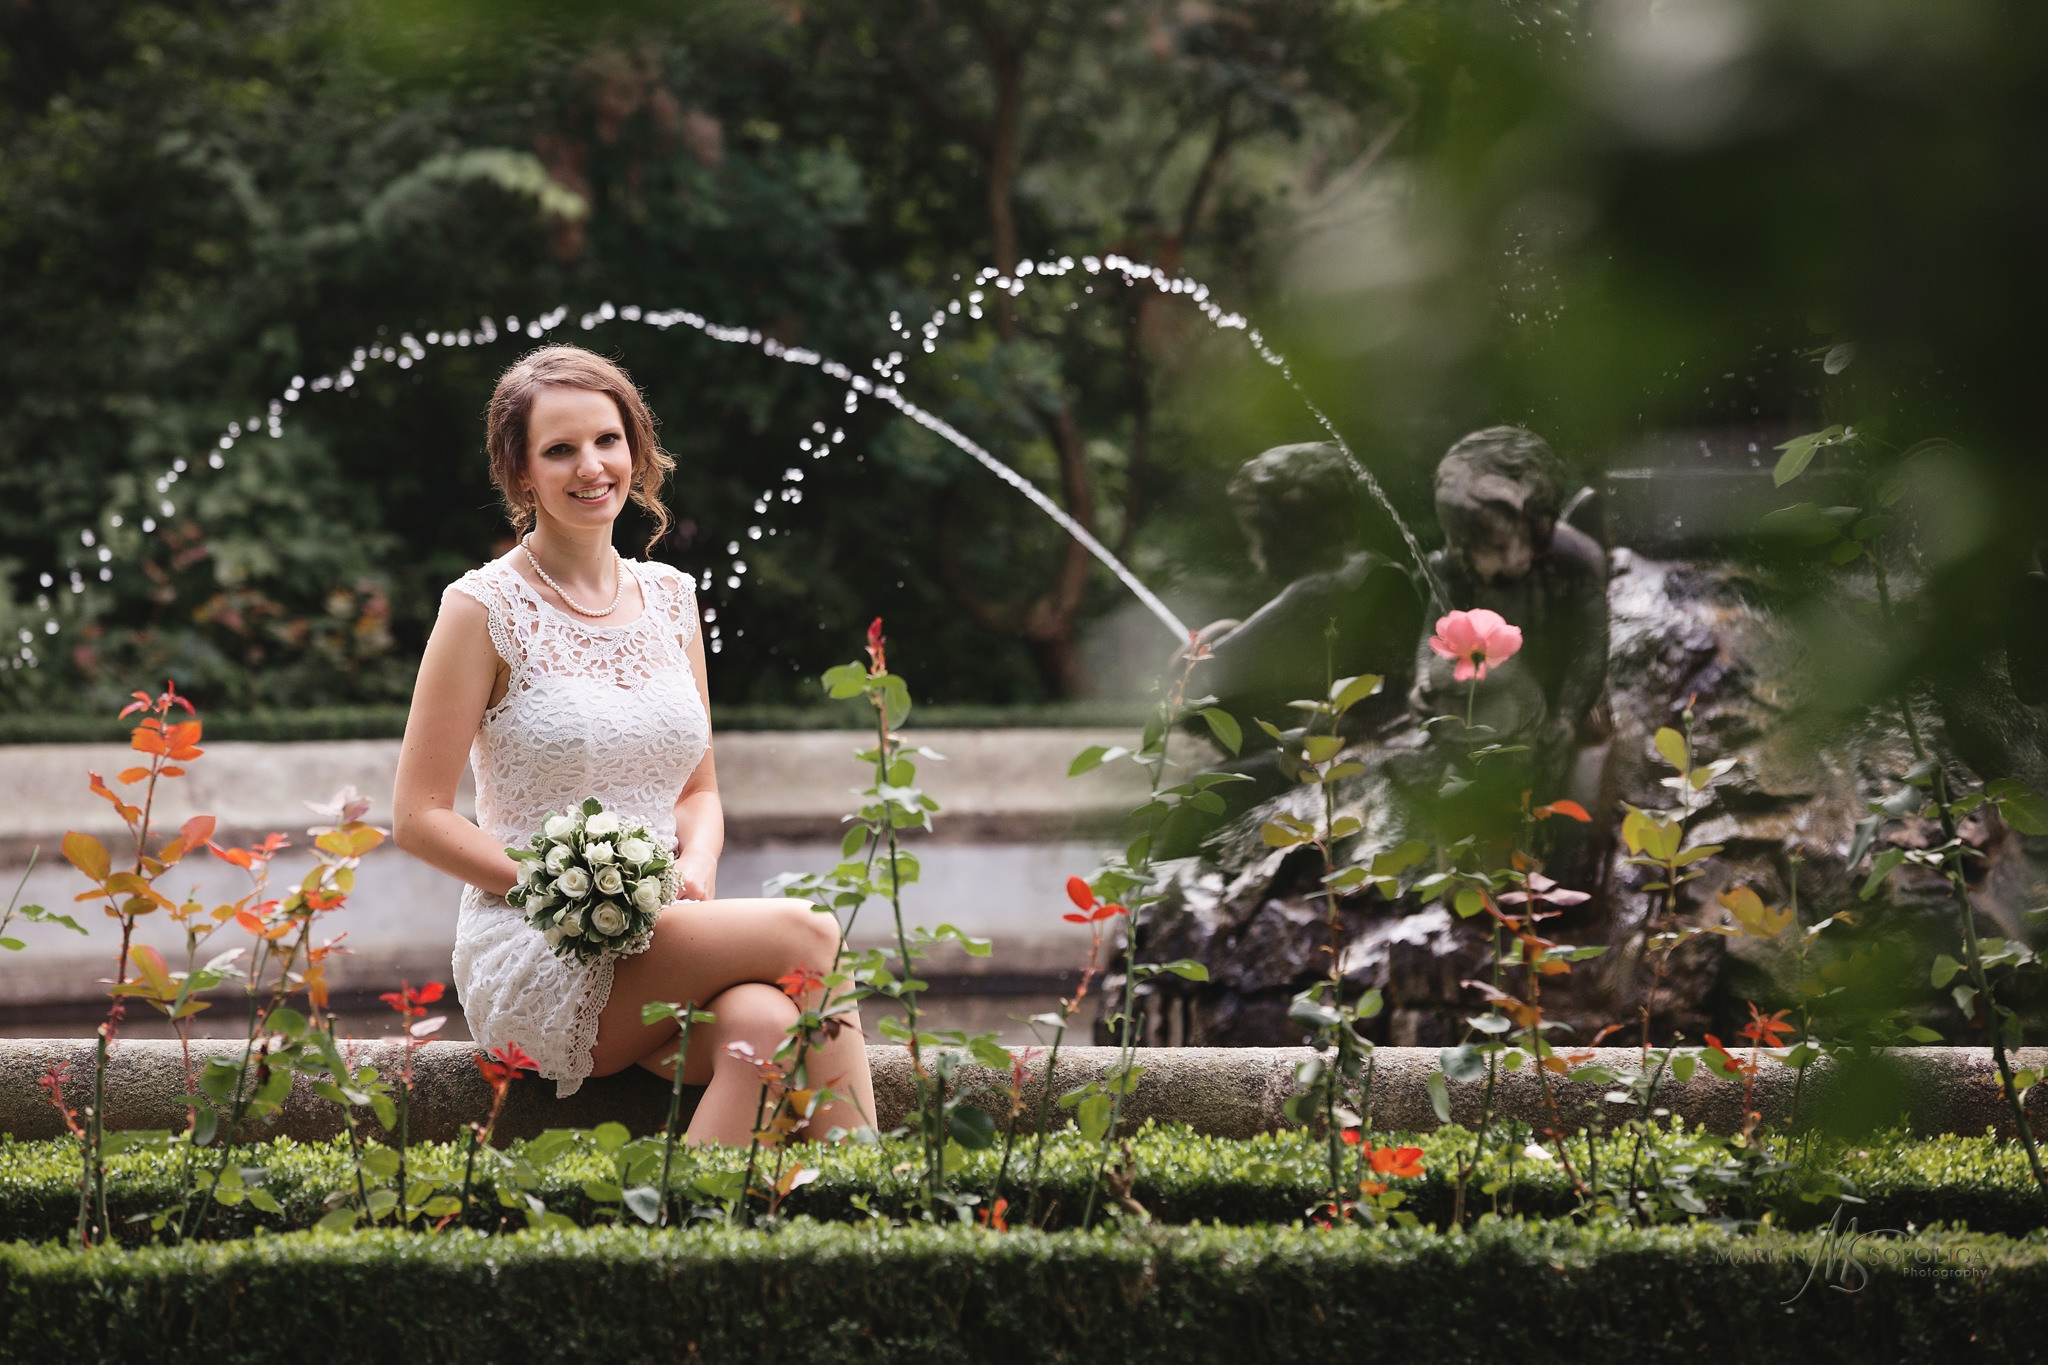 foceni-svateb-kromeriz-nevesta-u-kasny-v-podzamecke-zahrade.jpg